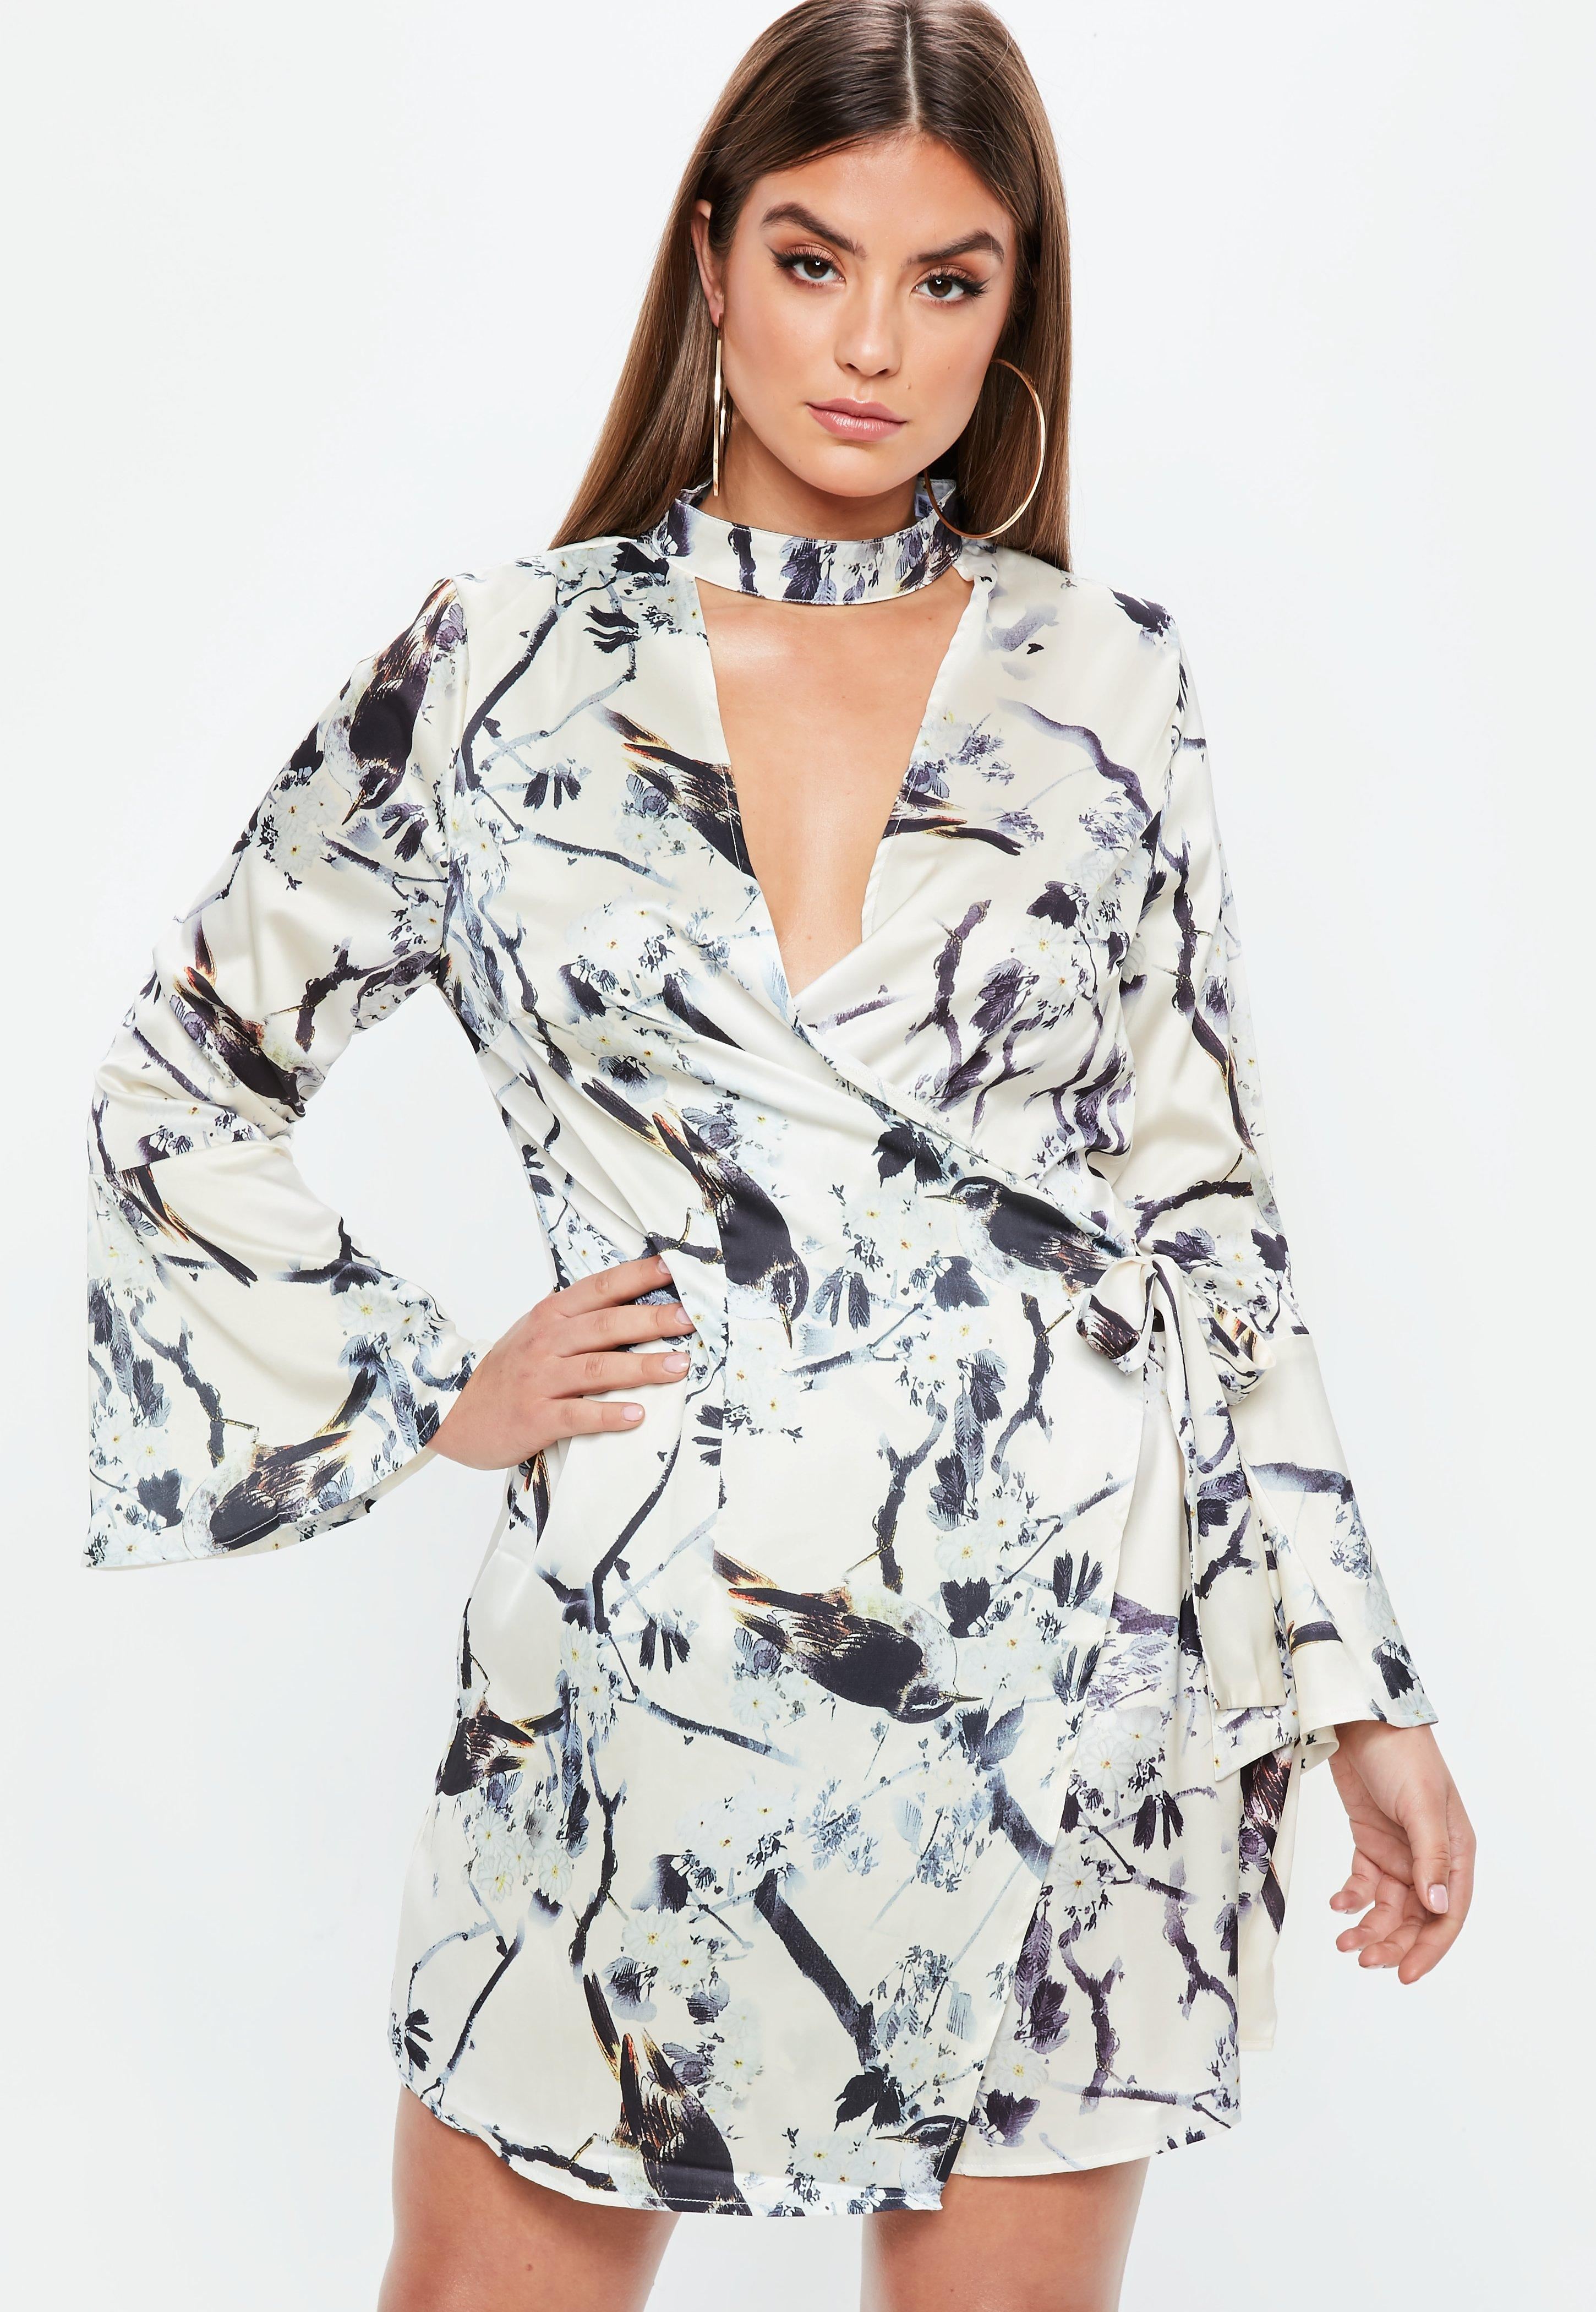 Plus Size Clothing | Womens Plus Size Fashion - Missguided+